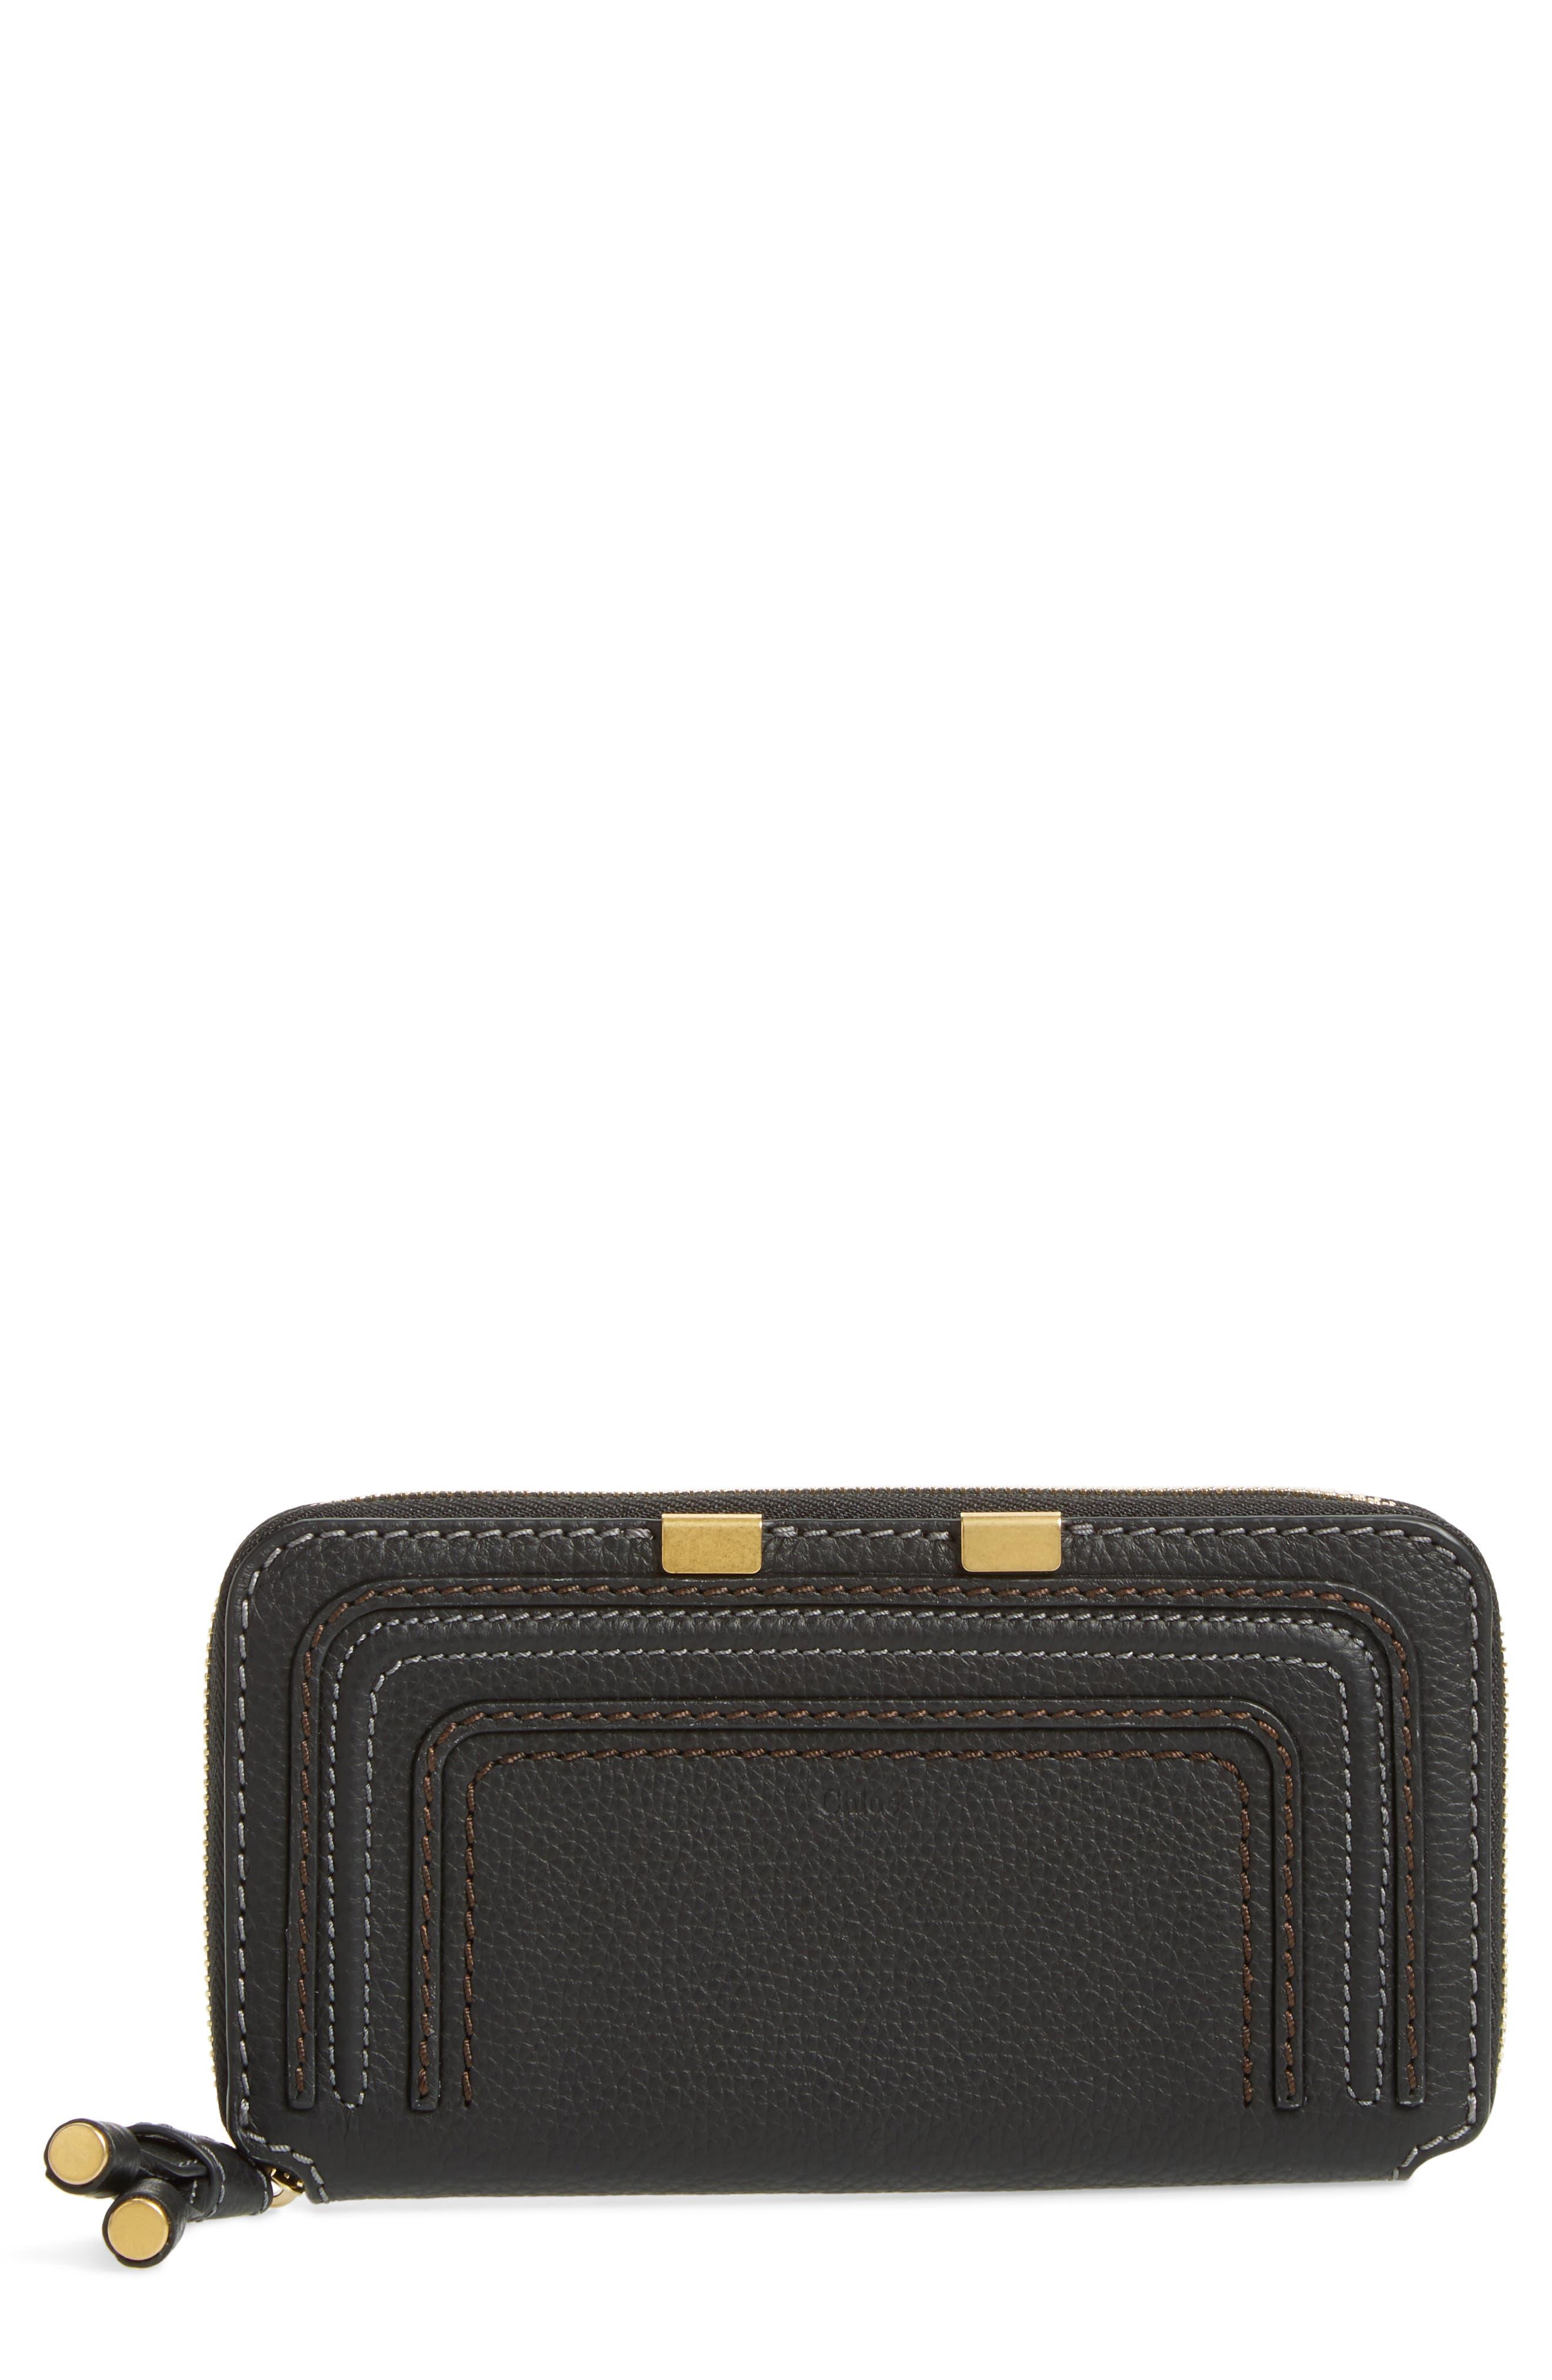 Main Image - Chloé 'Marcie - Long' Zip Around Wallet